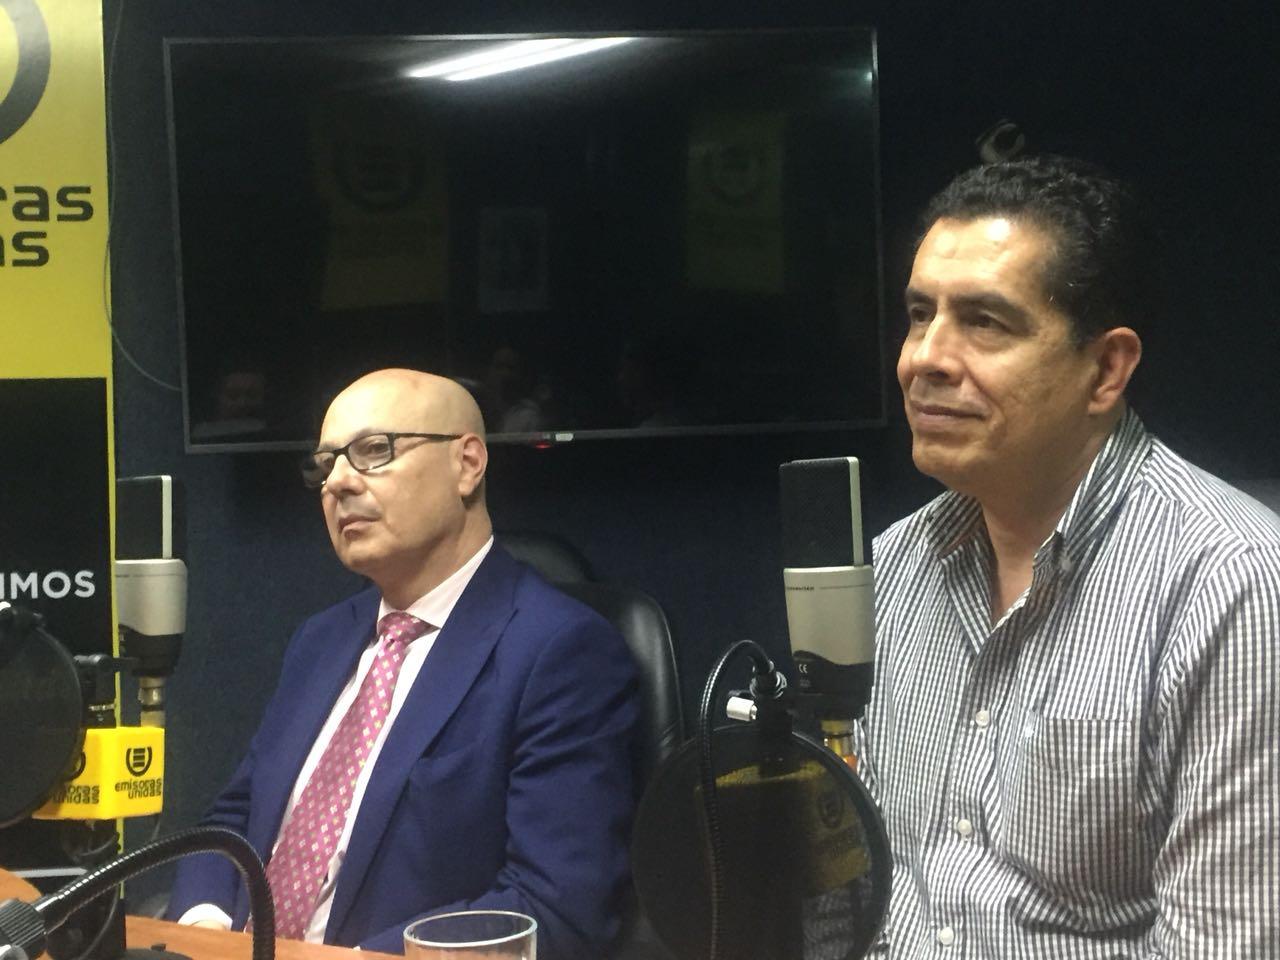 Seguridad vial EU Emisoras Unidas Guatemala